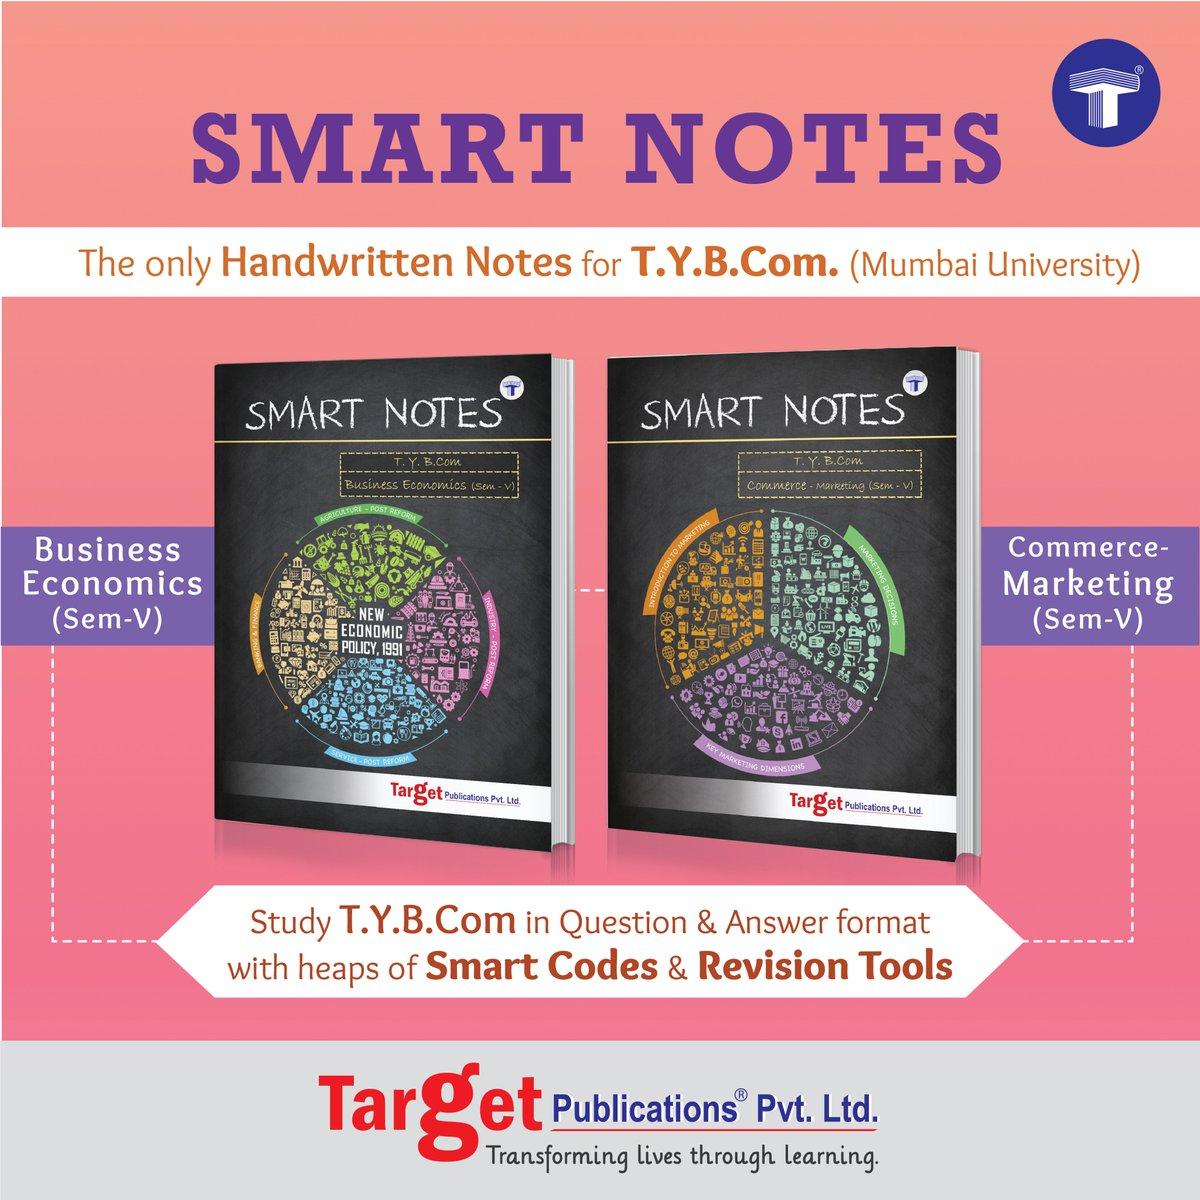 Target Publications Pvt  Ltd  (@targetppl) | Twitter